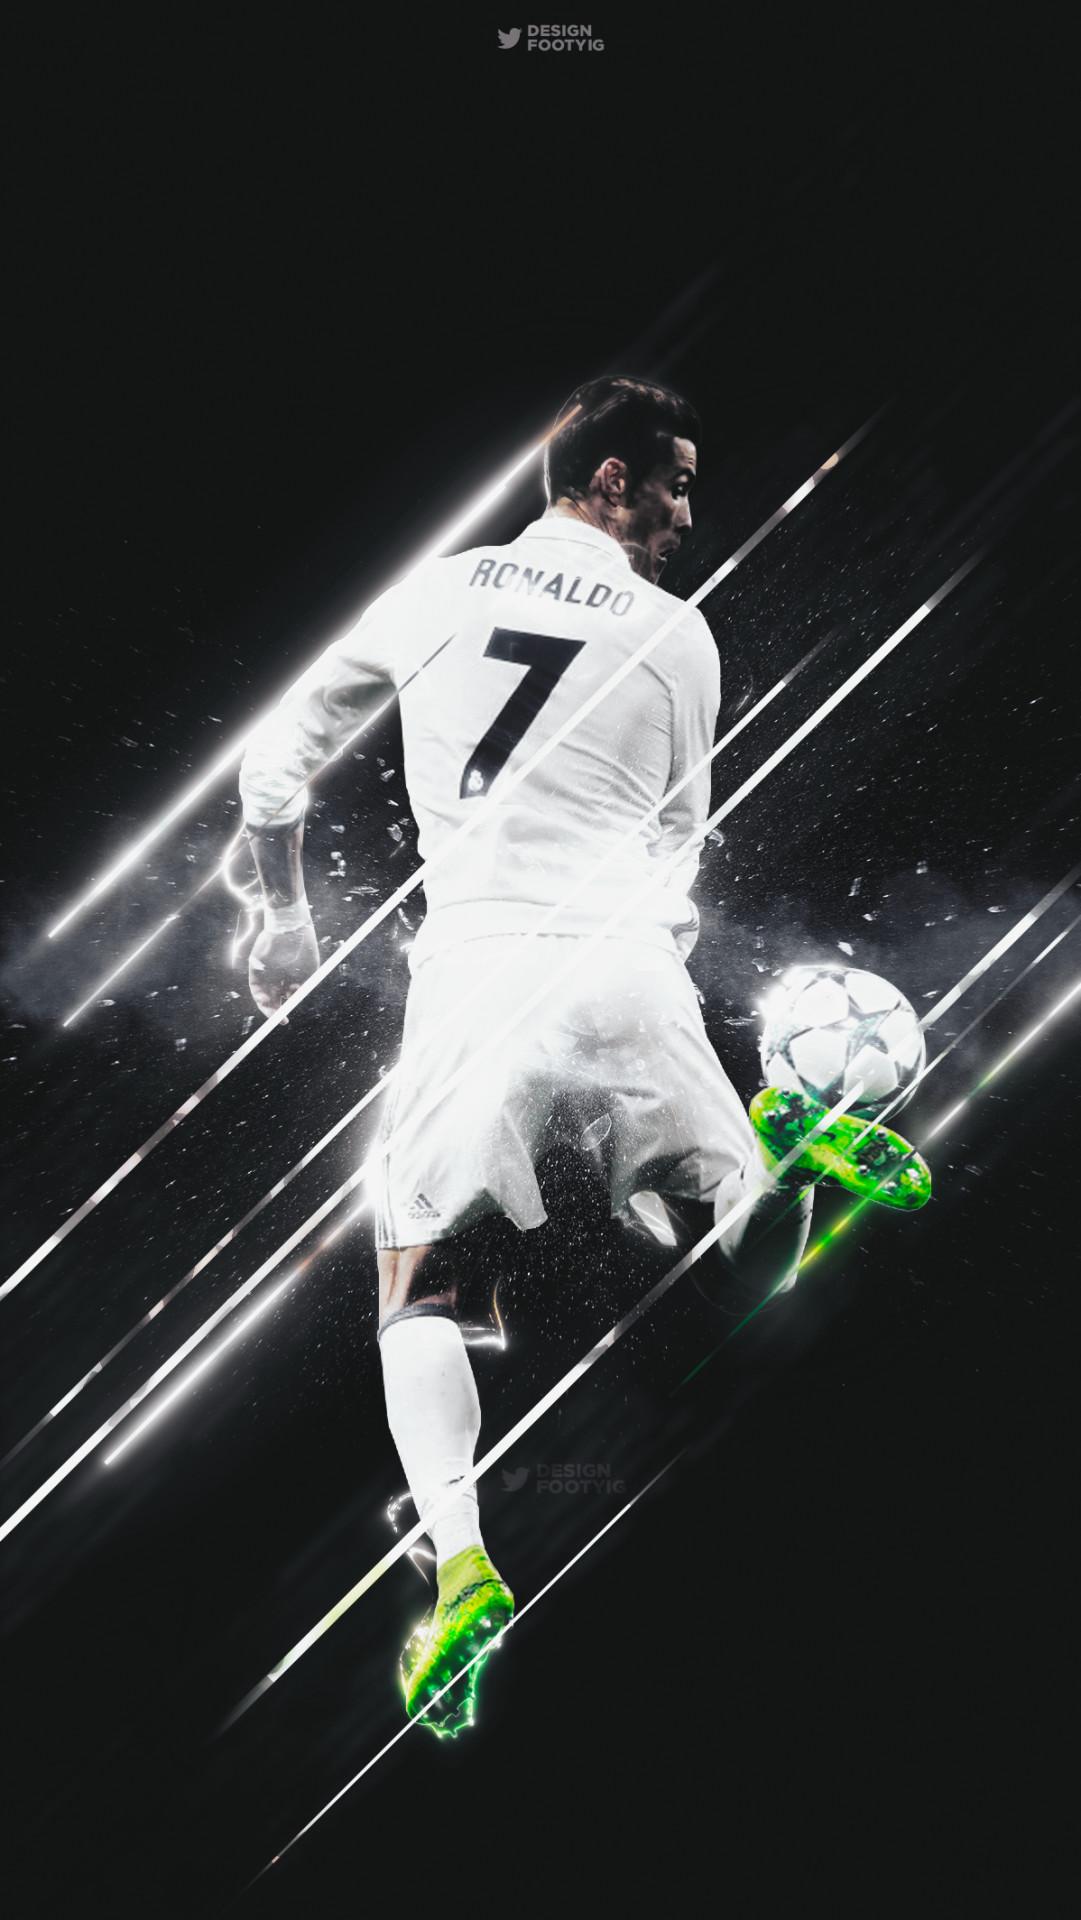 Res: 1081x1920, DESIGNDANIEL Cristiano Ronaldo edit / Phone wallpaper by Design Daniel on  tumblr. Real Madrid,